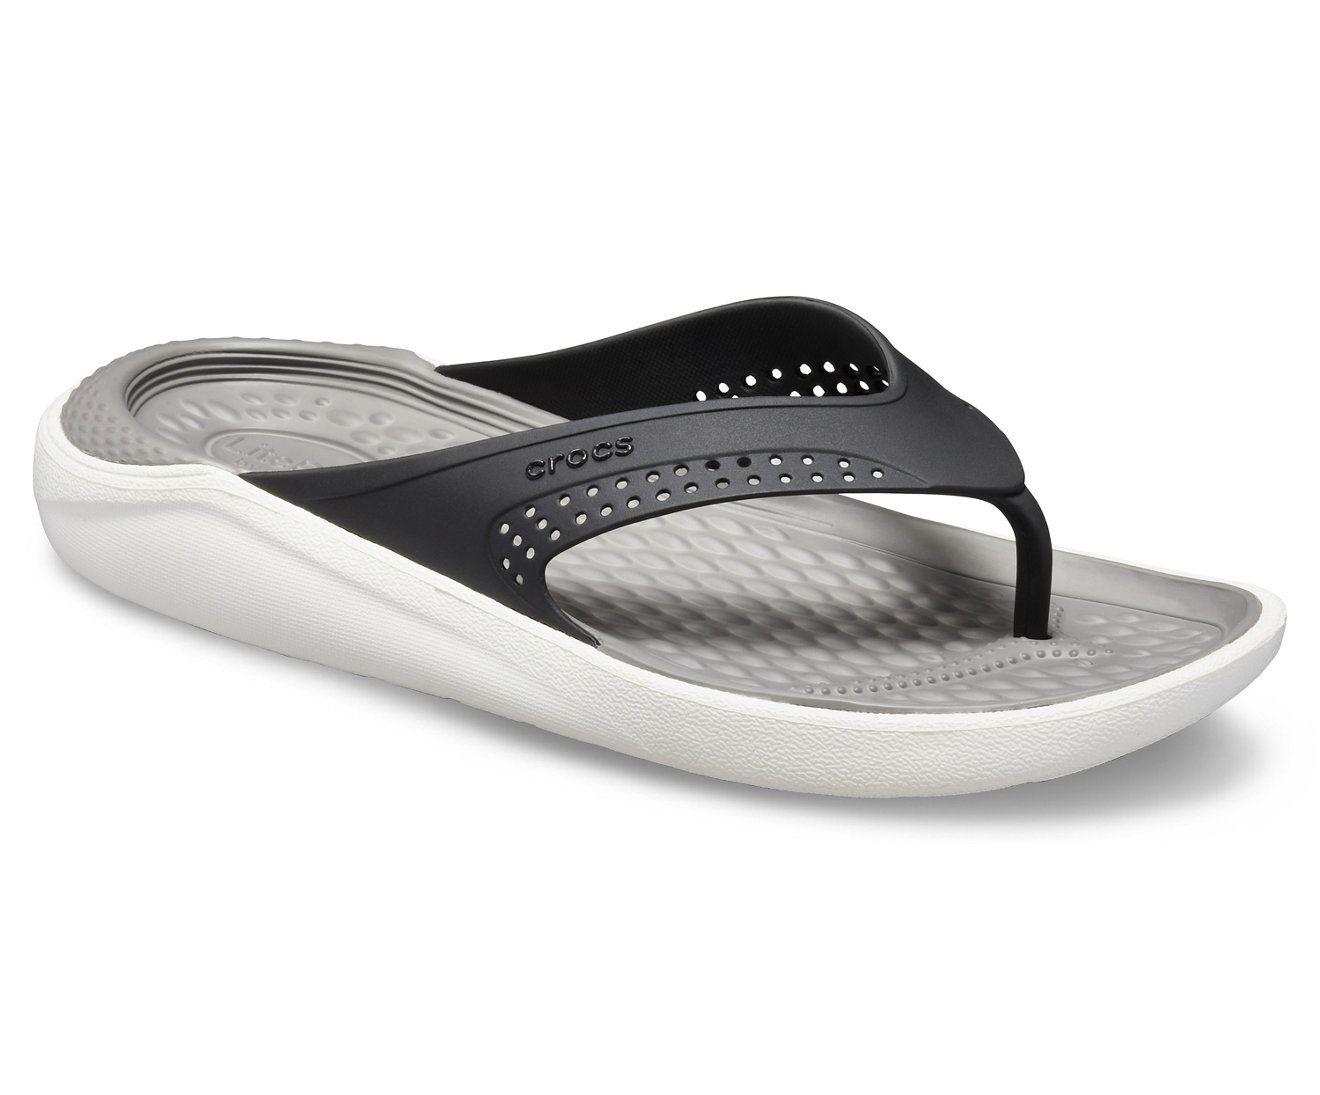 Crocs LiteRide Kids Black Flip